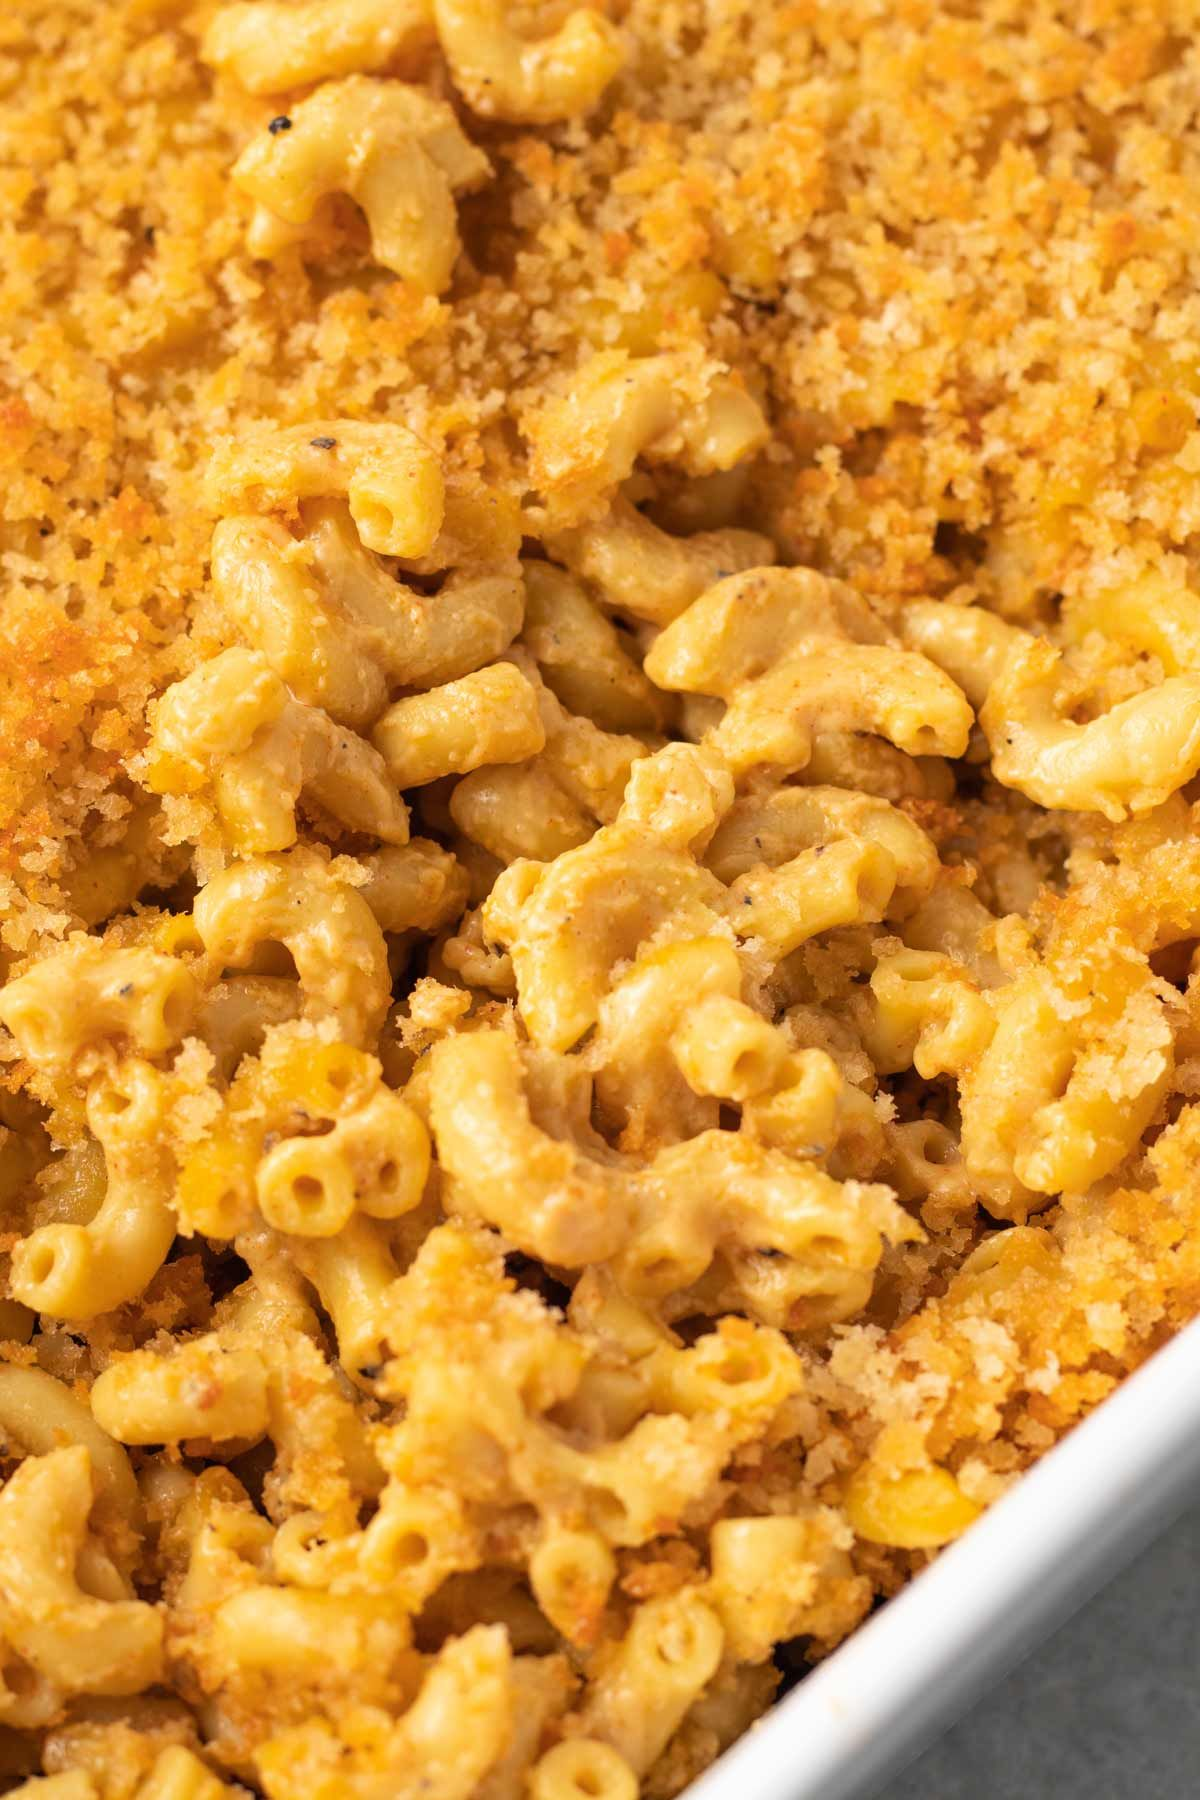 Baked Vegan Mac And Cheese Karissa S Vegan Kitchen Recipe In 2020 Vegan Mac And Cheese Comfort Food Recipes Casseroles Vegan Kitchen